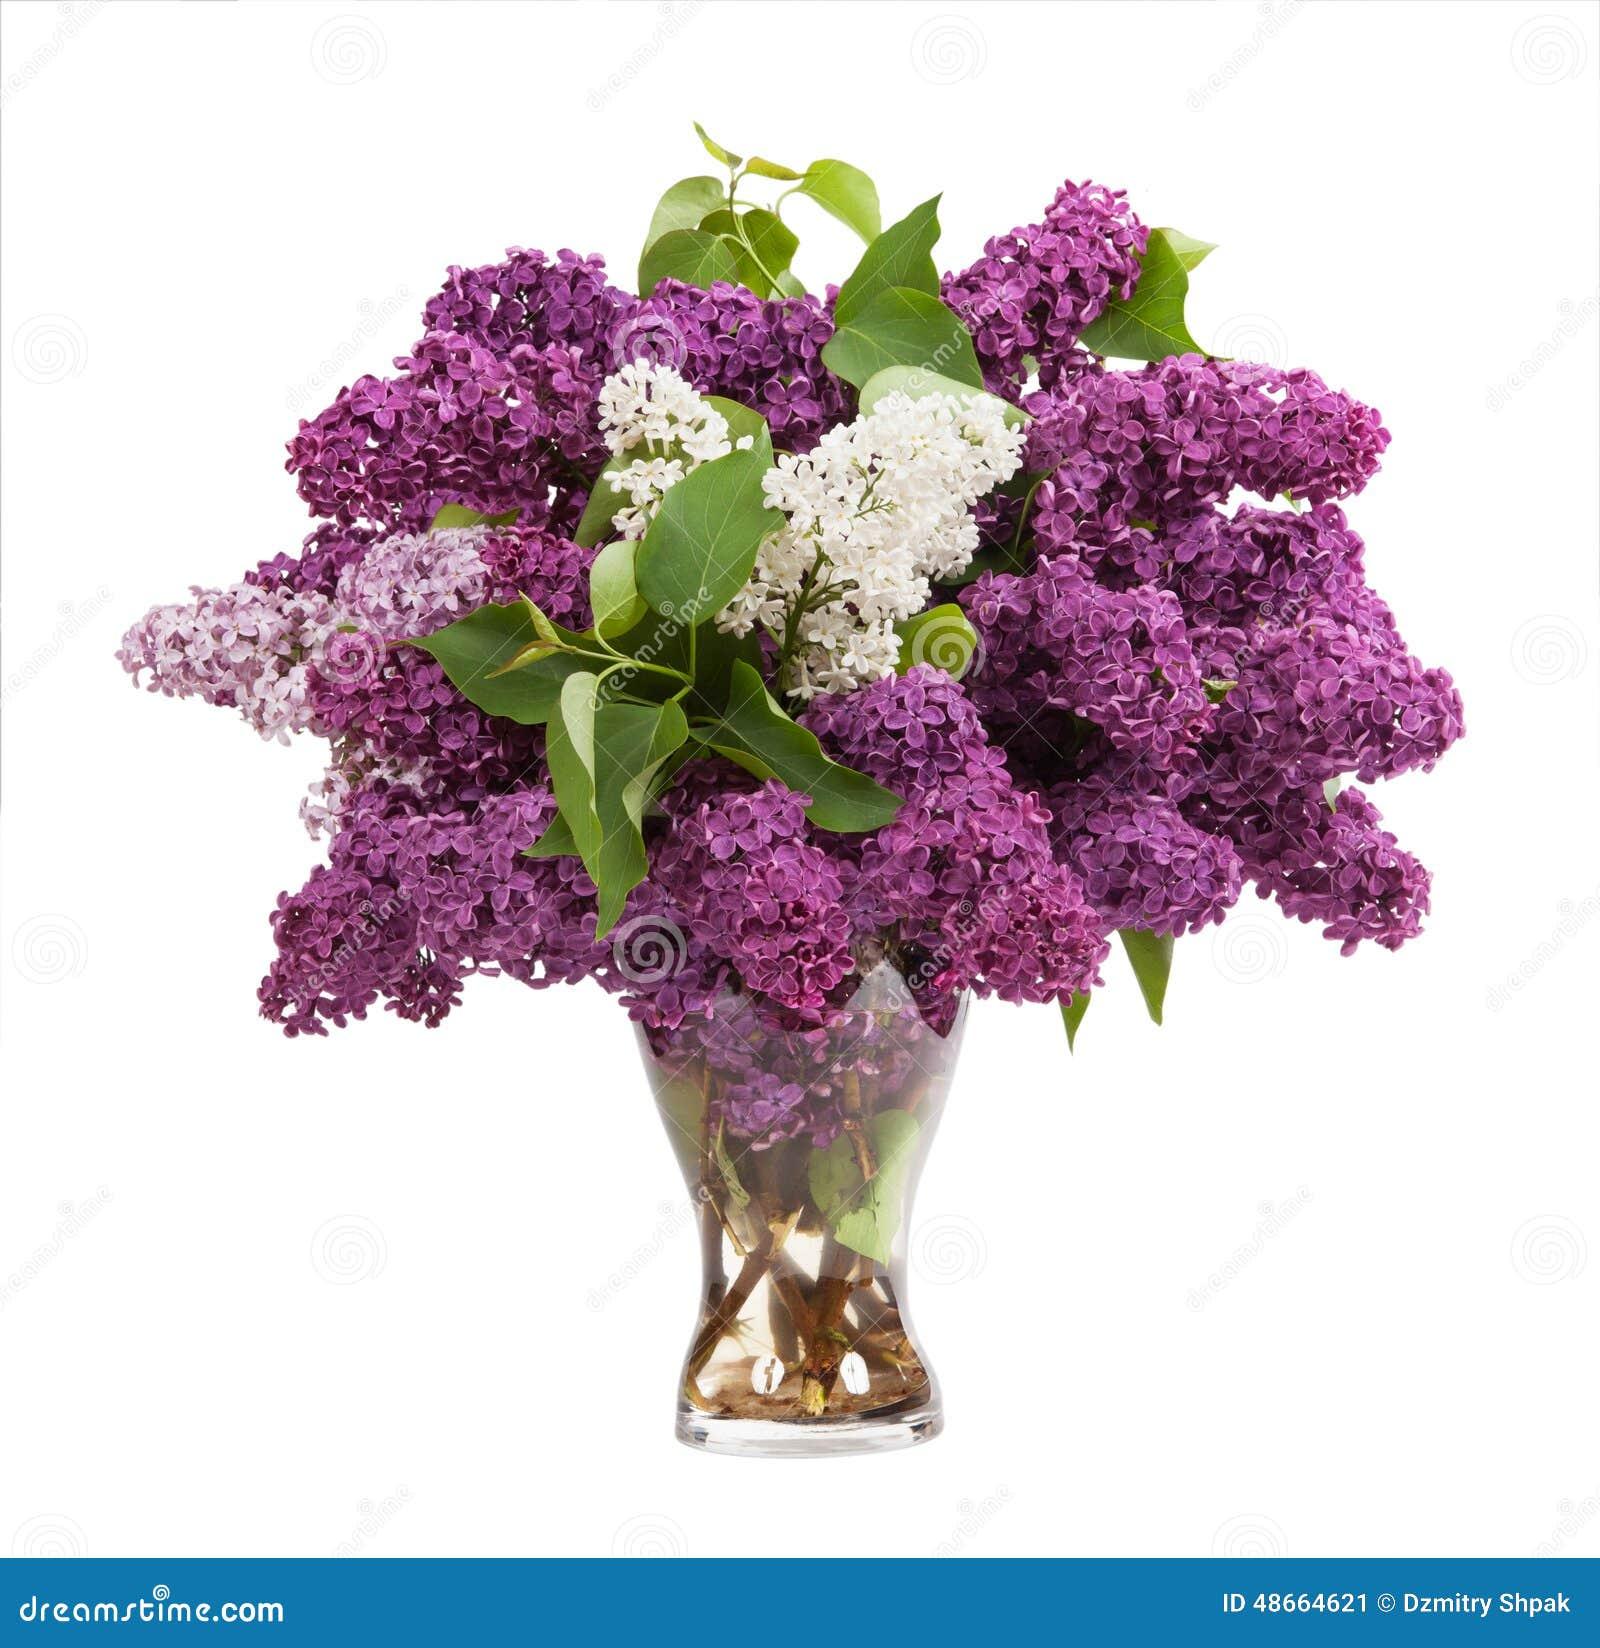 lilacs in a glass vase stock image image of still color 48664621. Black Bedroom Furniture Sets. Home Design Ideas